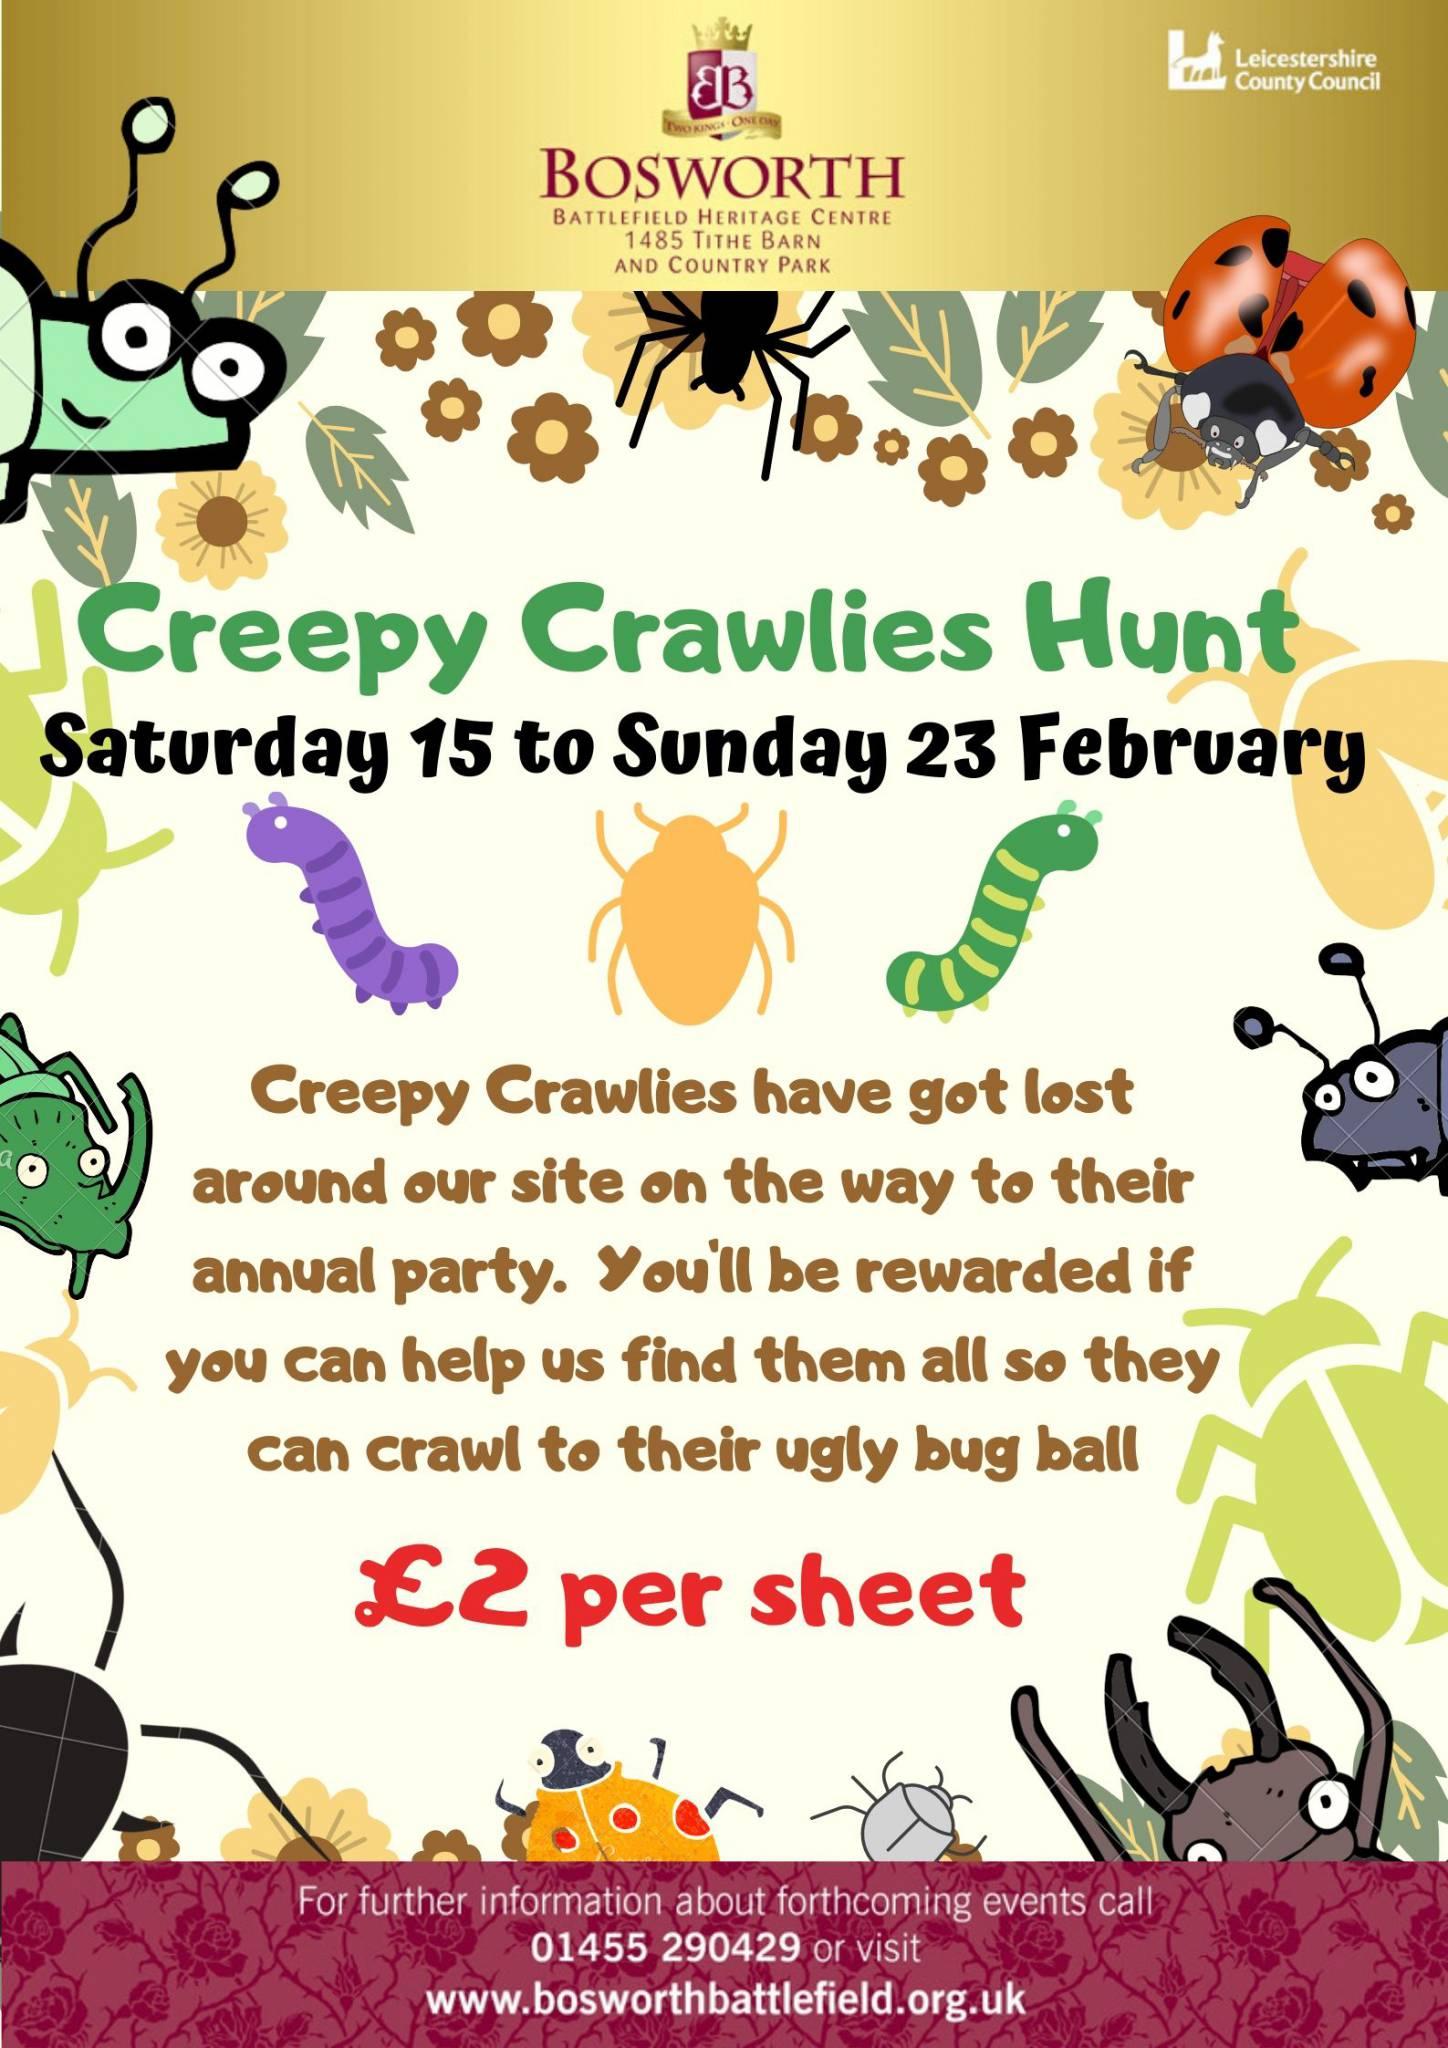 Creepy Crawlies Hunt